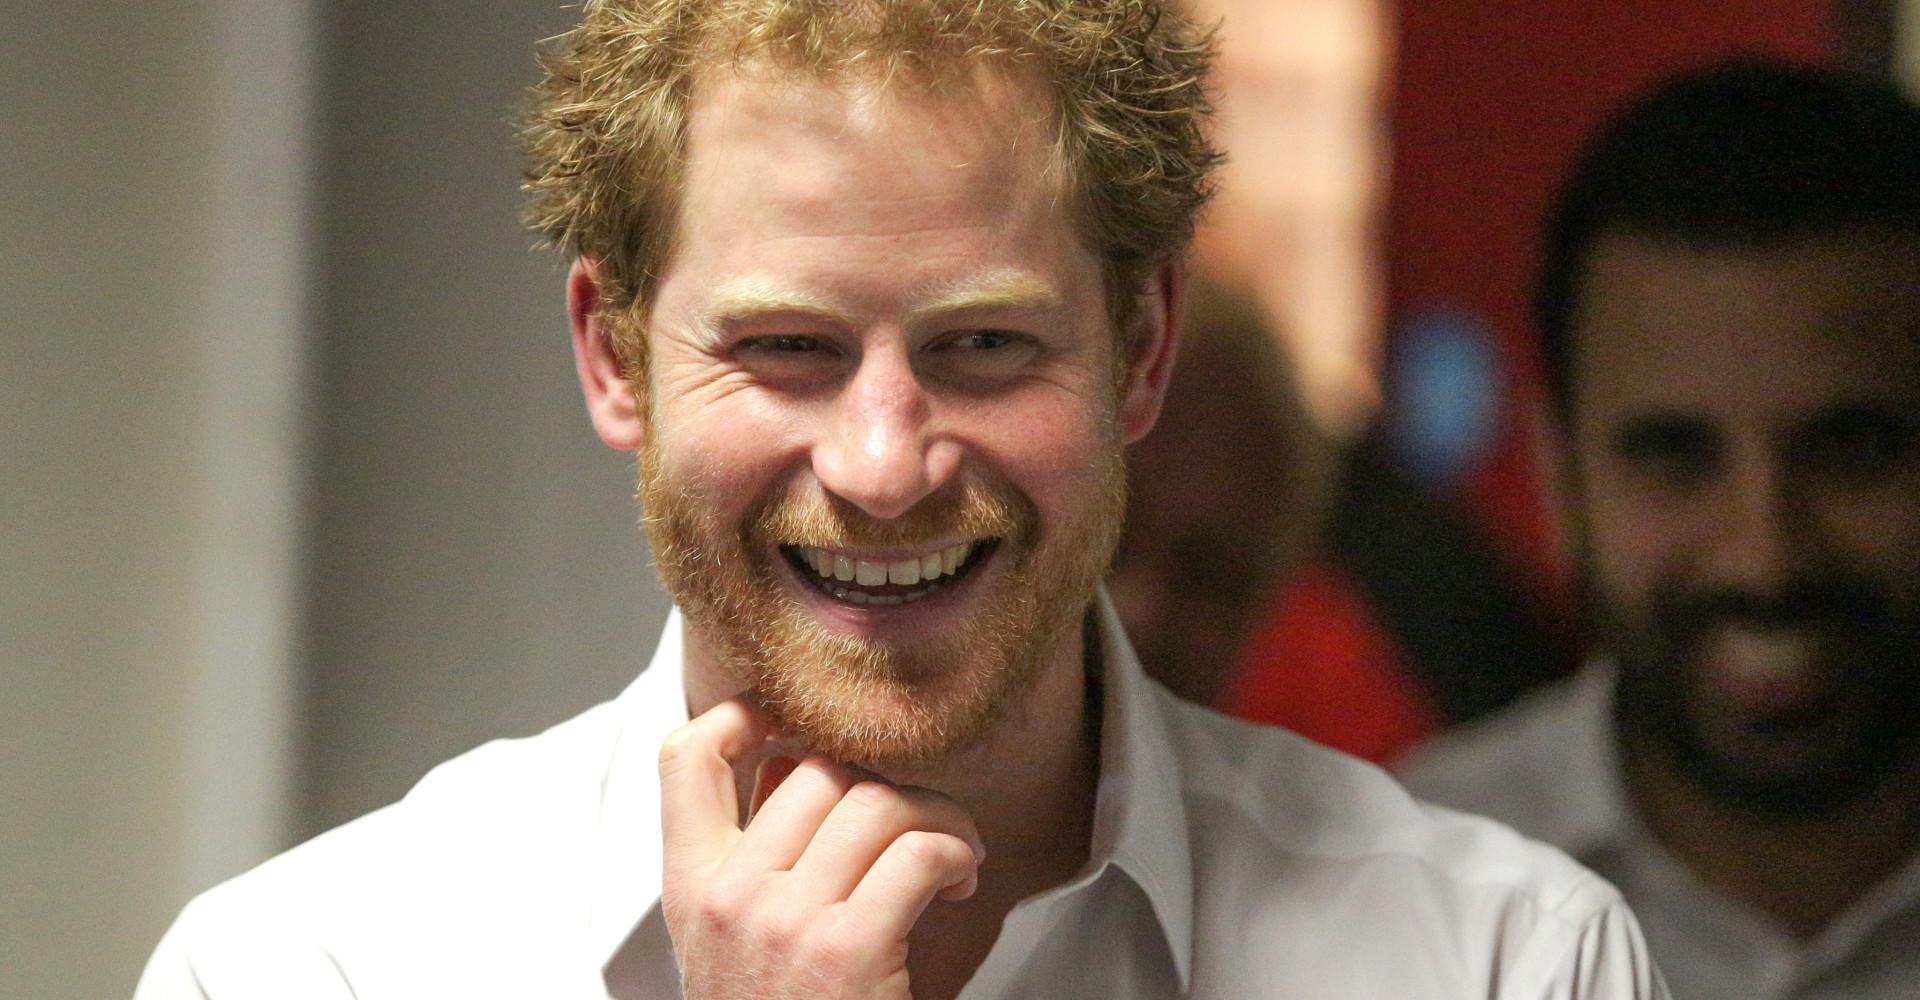 Did Prince Harry break royal fashion protocol by wearing a Speedo?